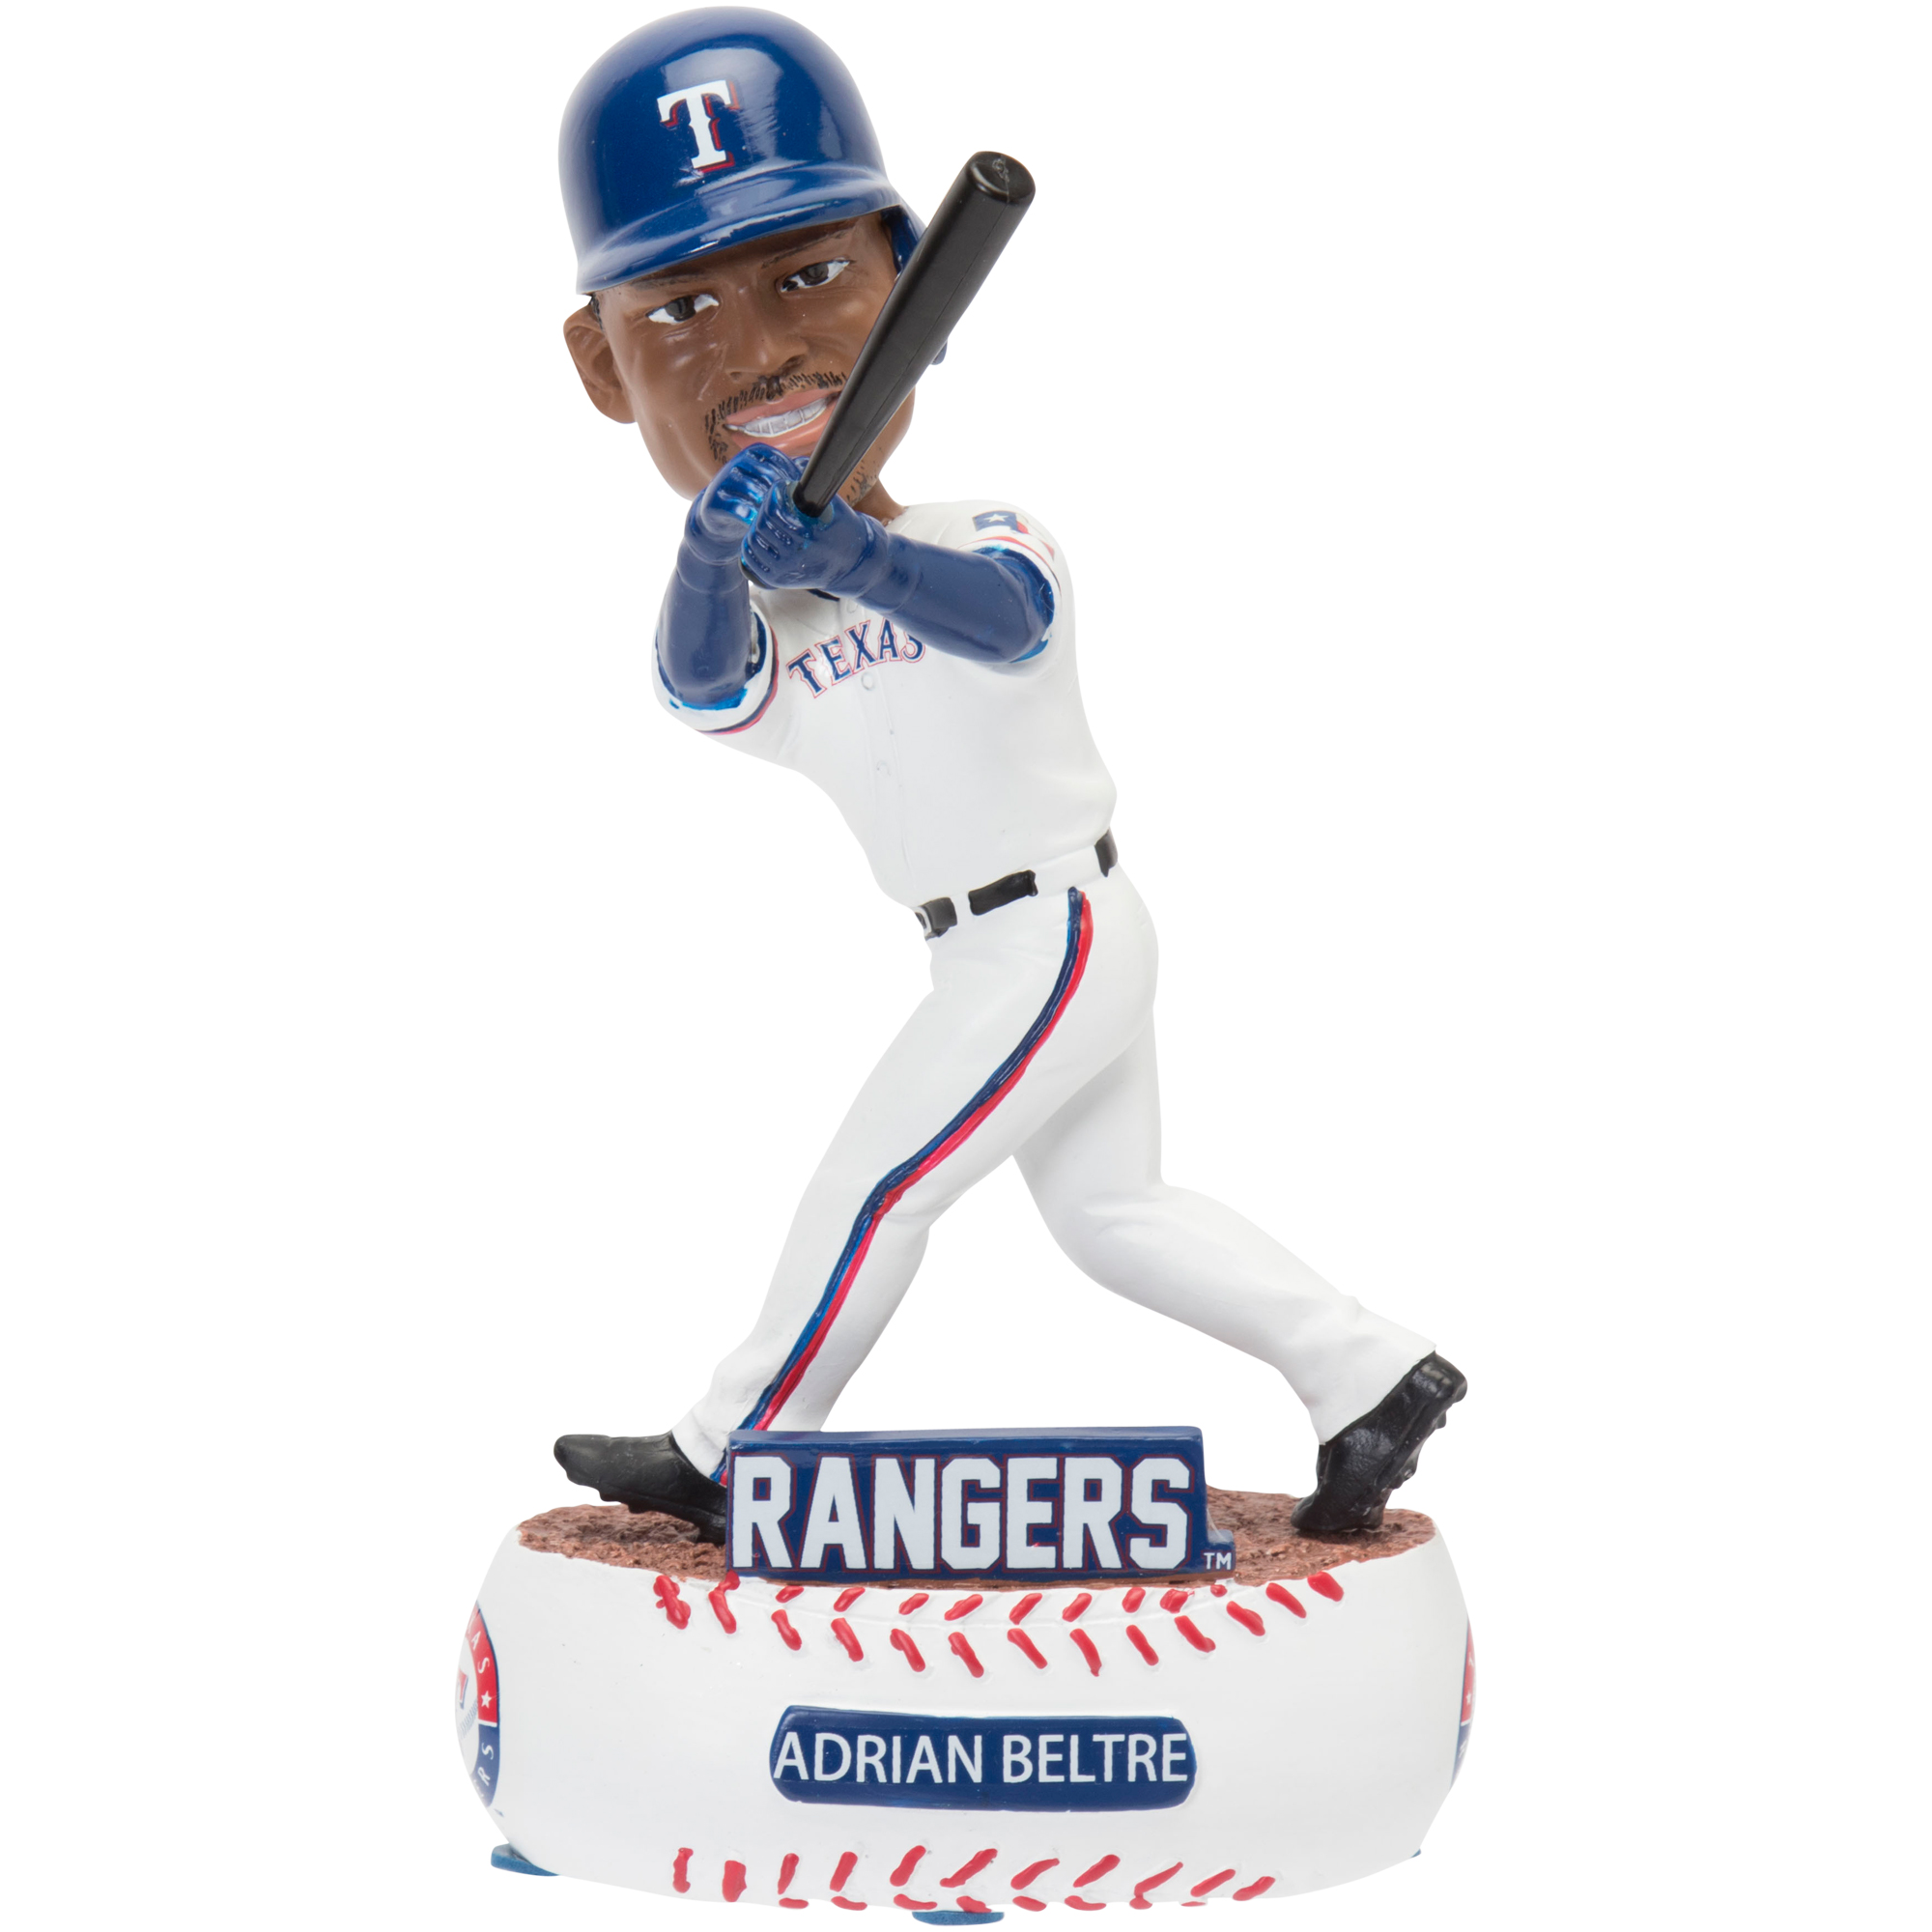 Adrian Beltre Texas Rangers Player Baller Bobblehead - No Size